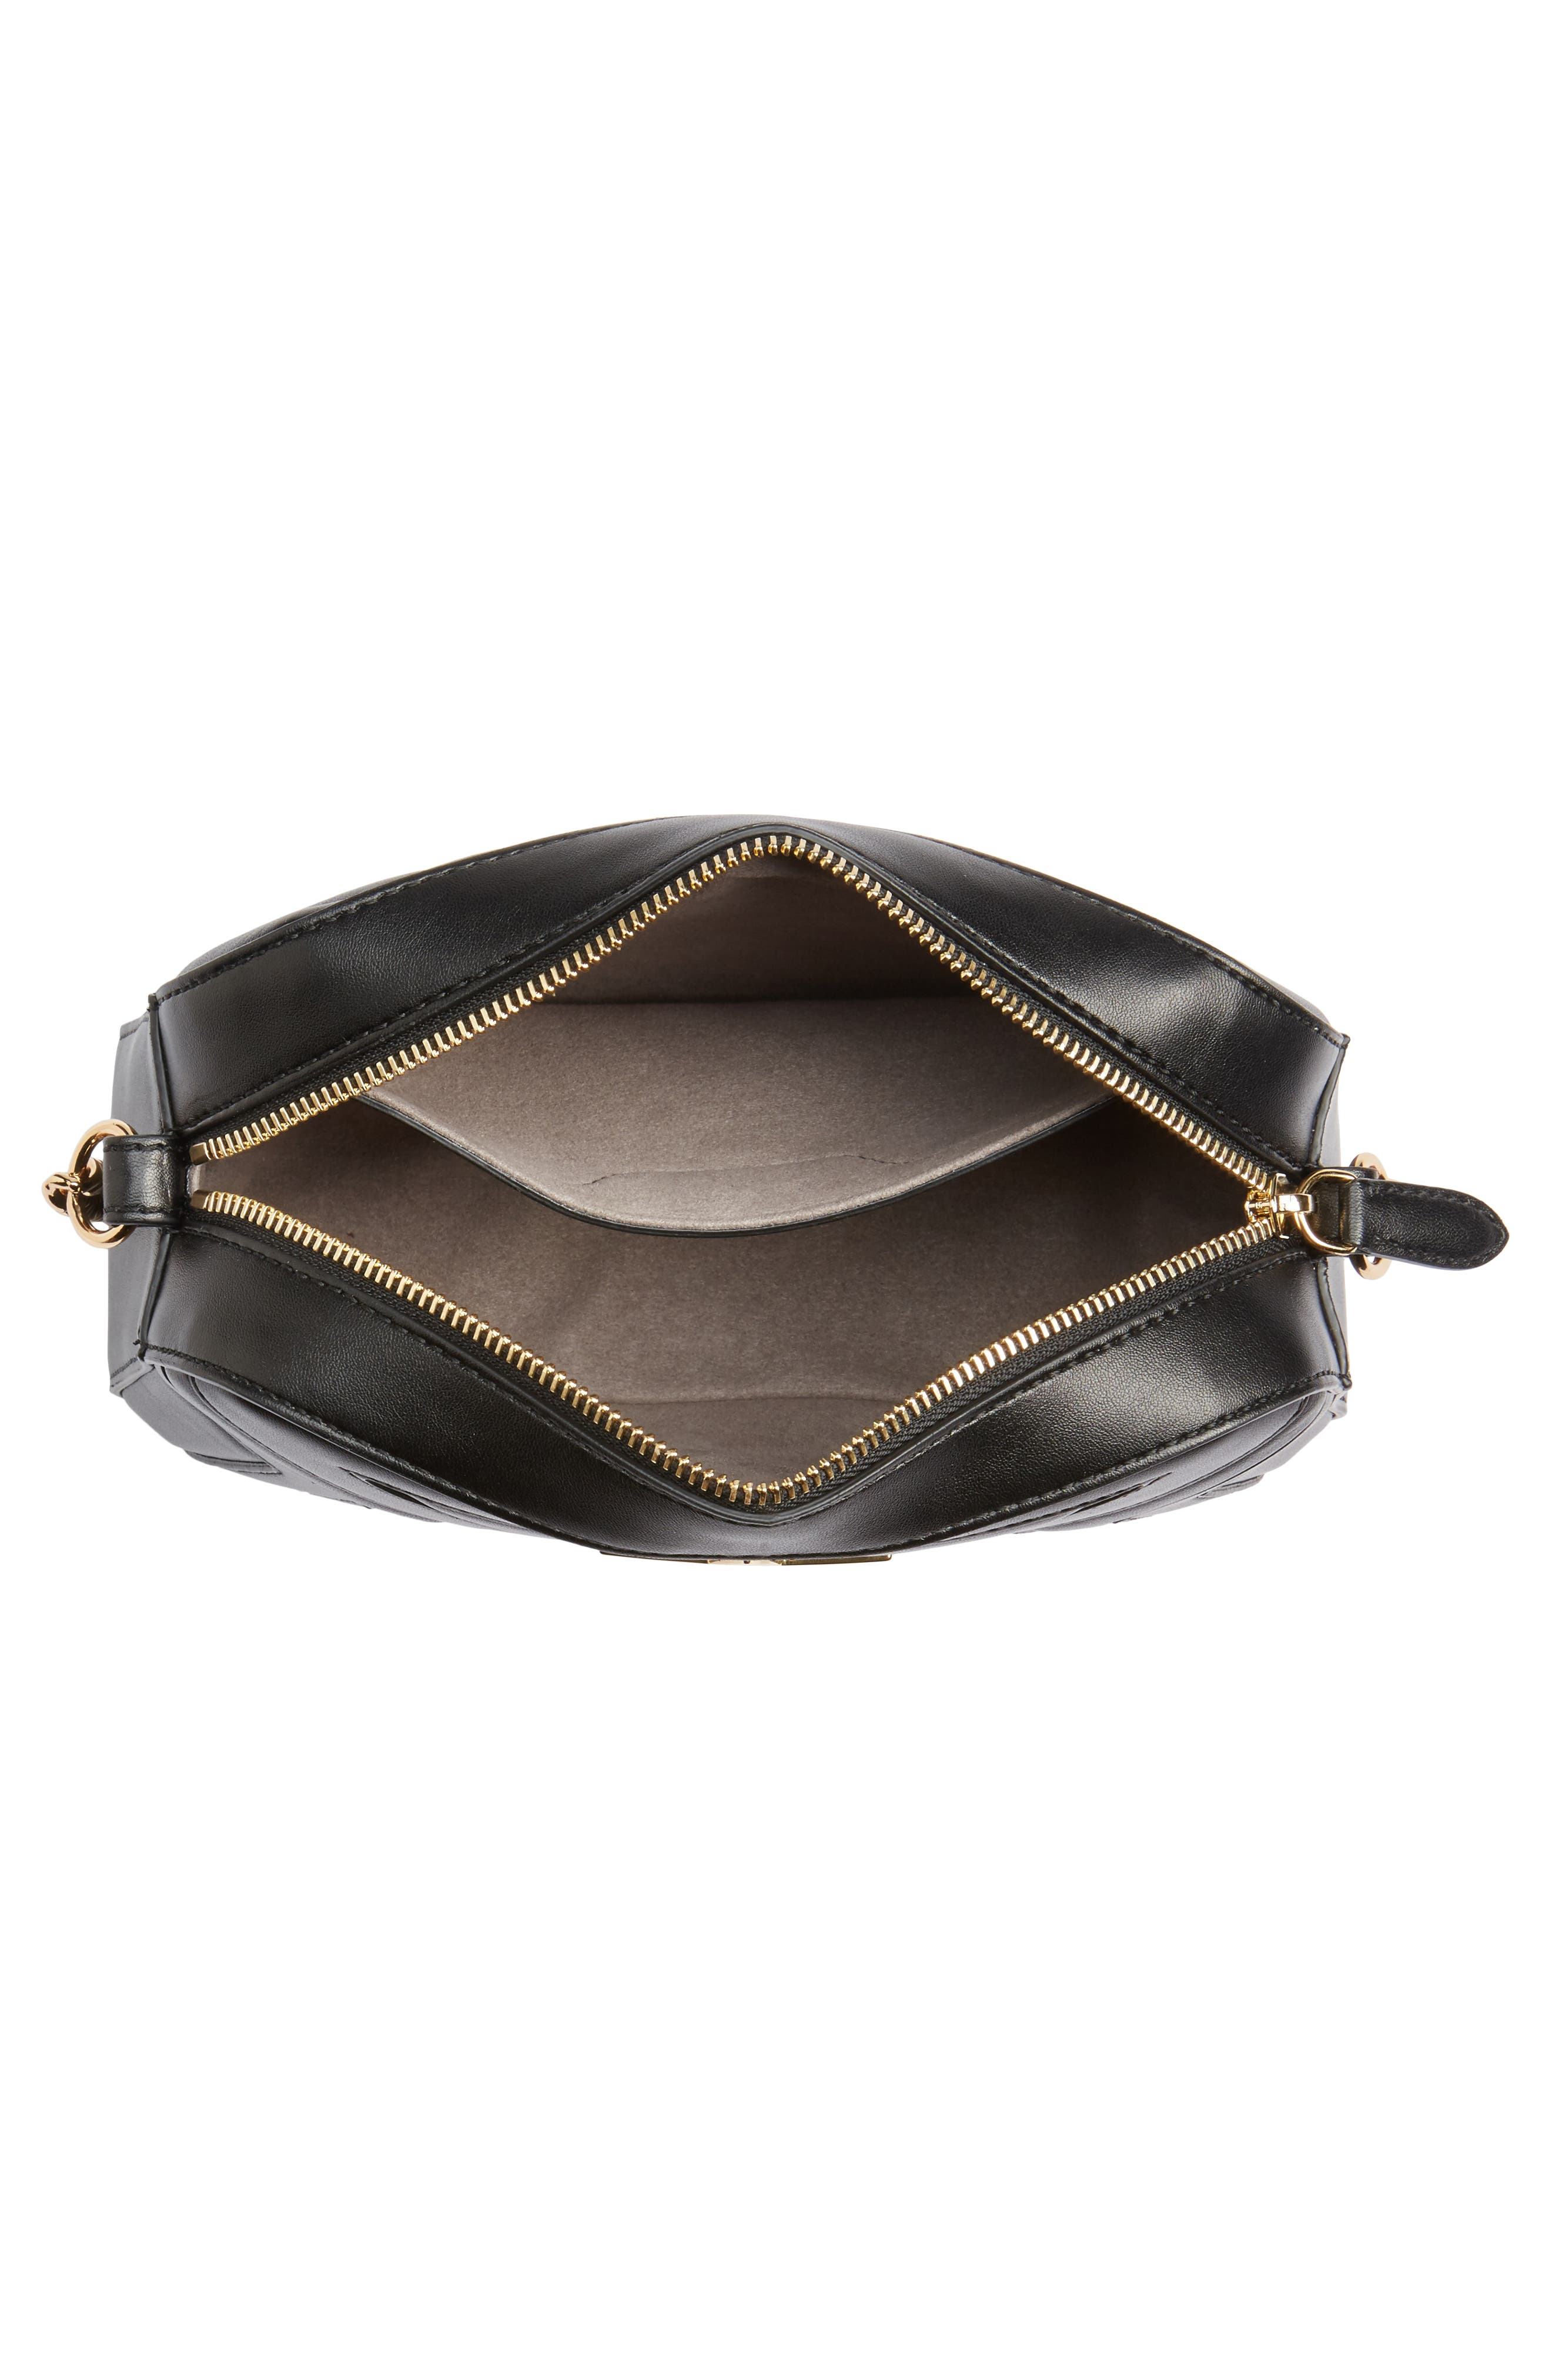 Alter Nappa Faux Leather Shoulder Bag,                             Alternate thumbnail 4, color,                             BLACK